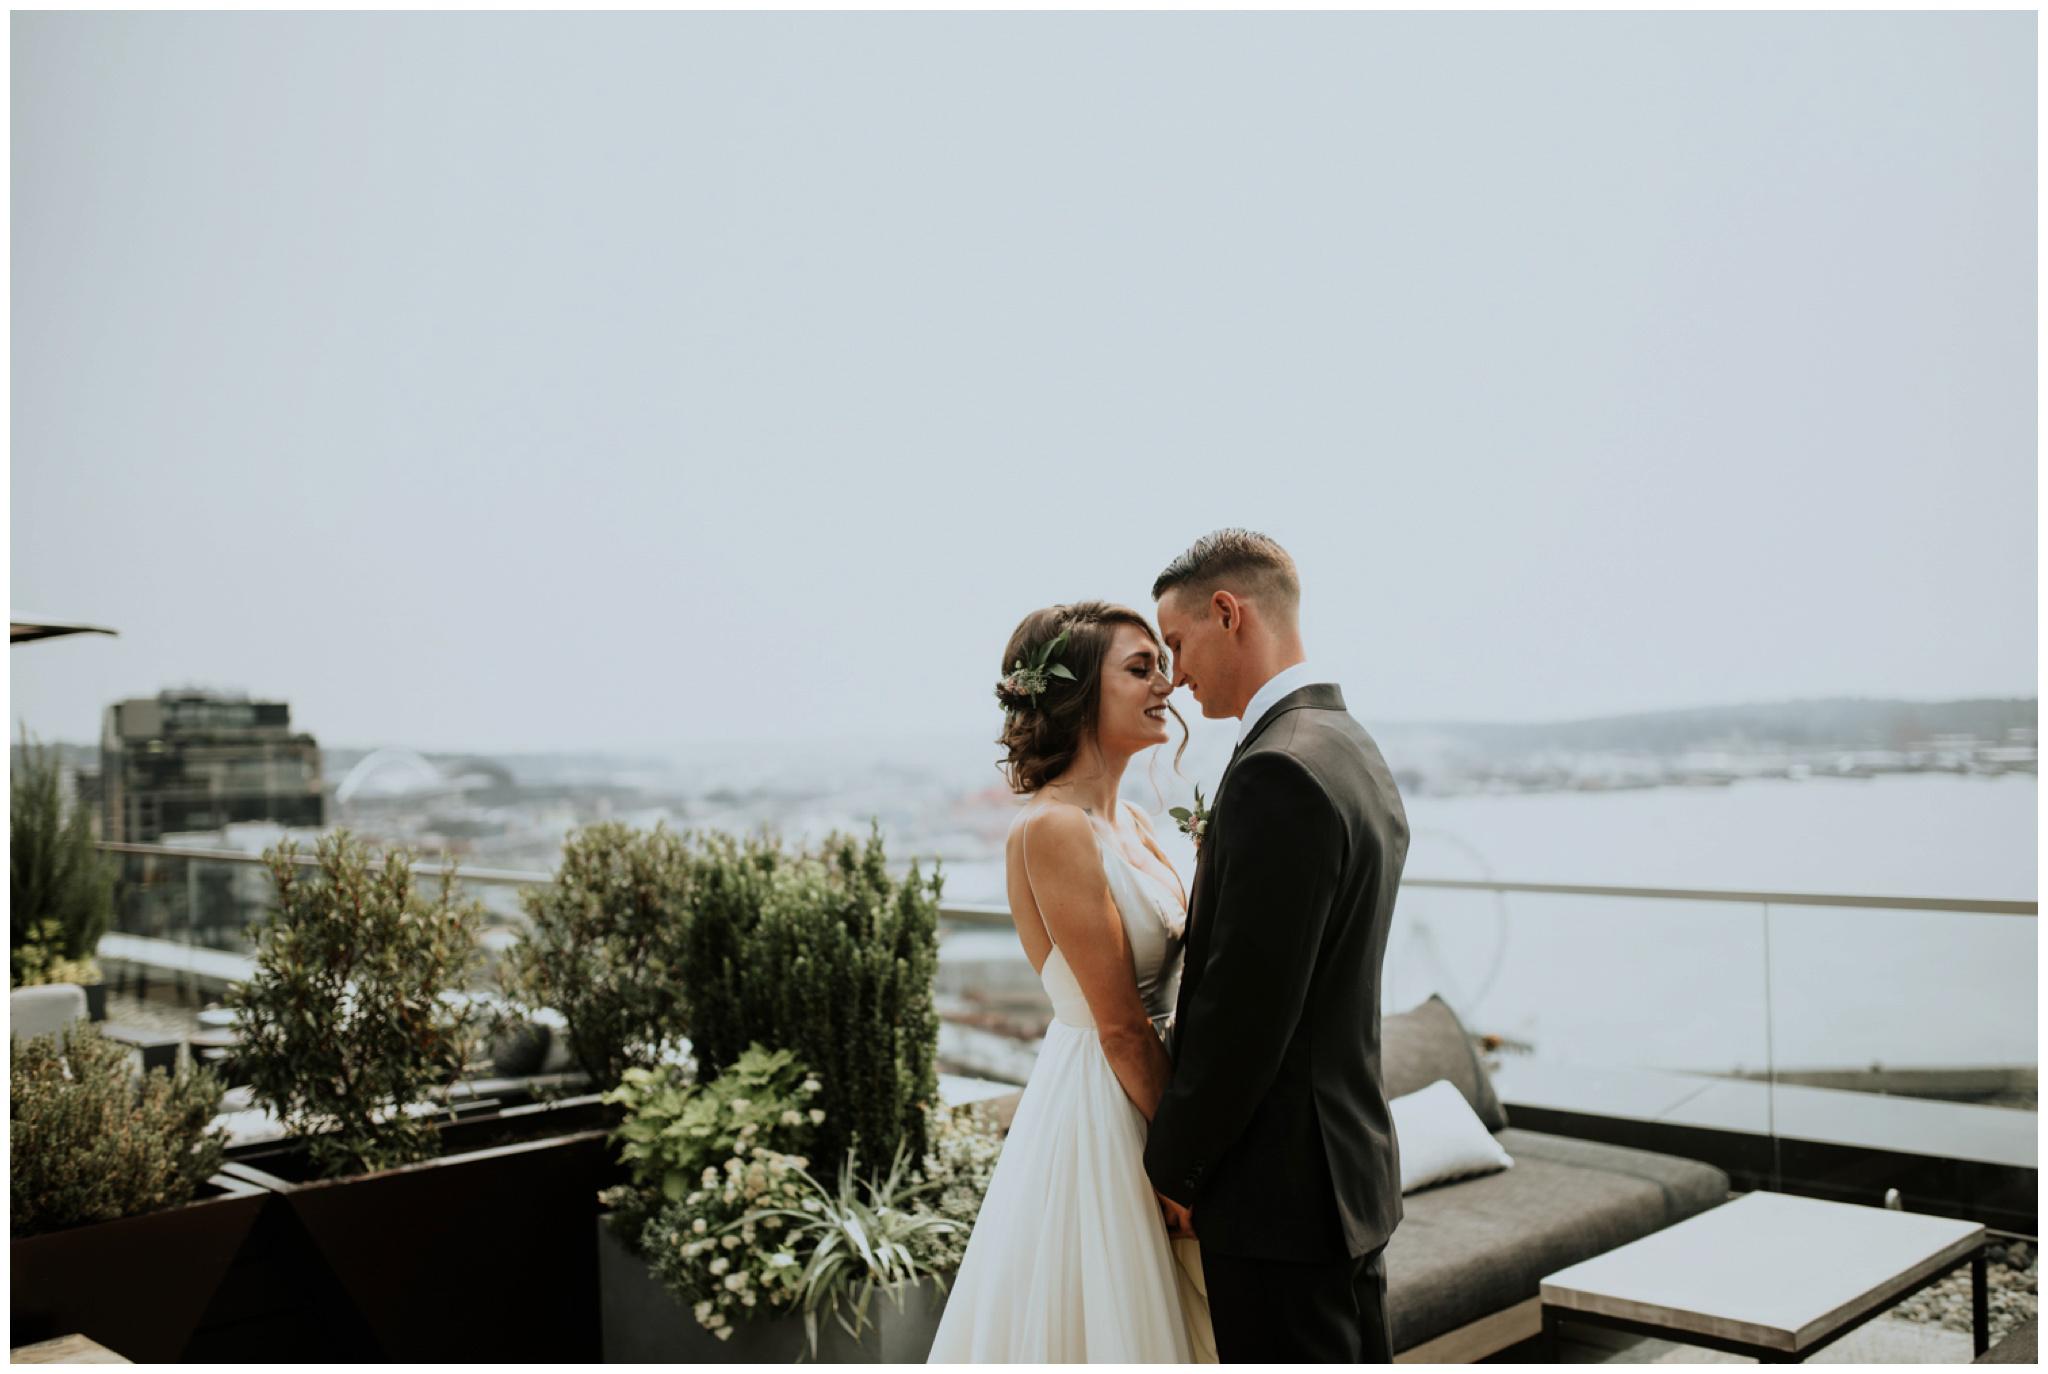 alyssa-keiran-westland-distillery-urban-seattle-wedding-photographer-caitlyn-nikula-51.jpg